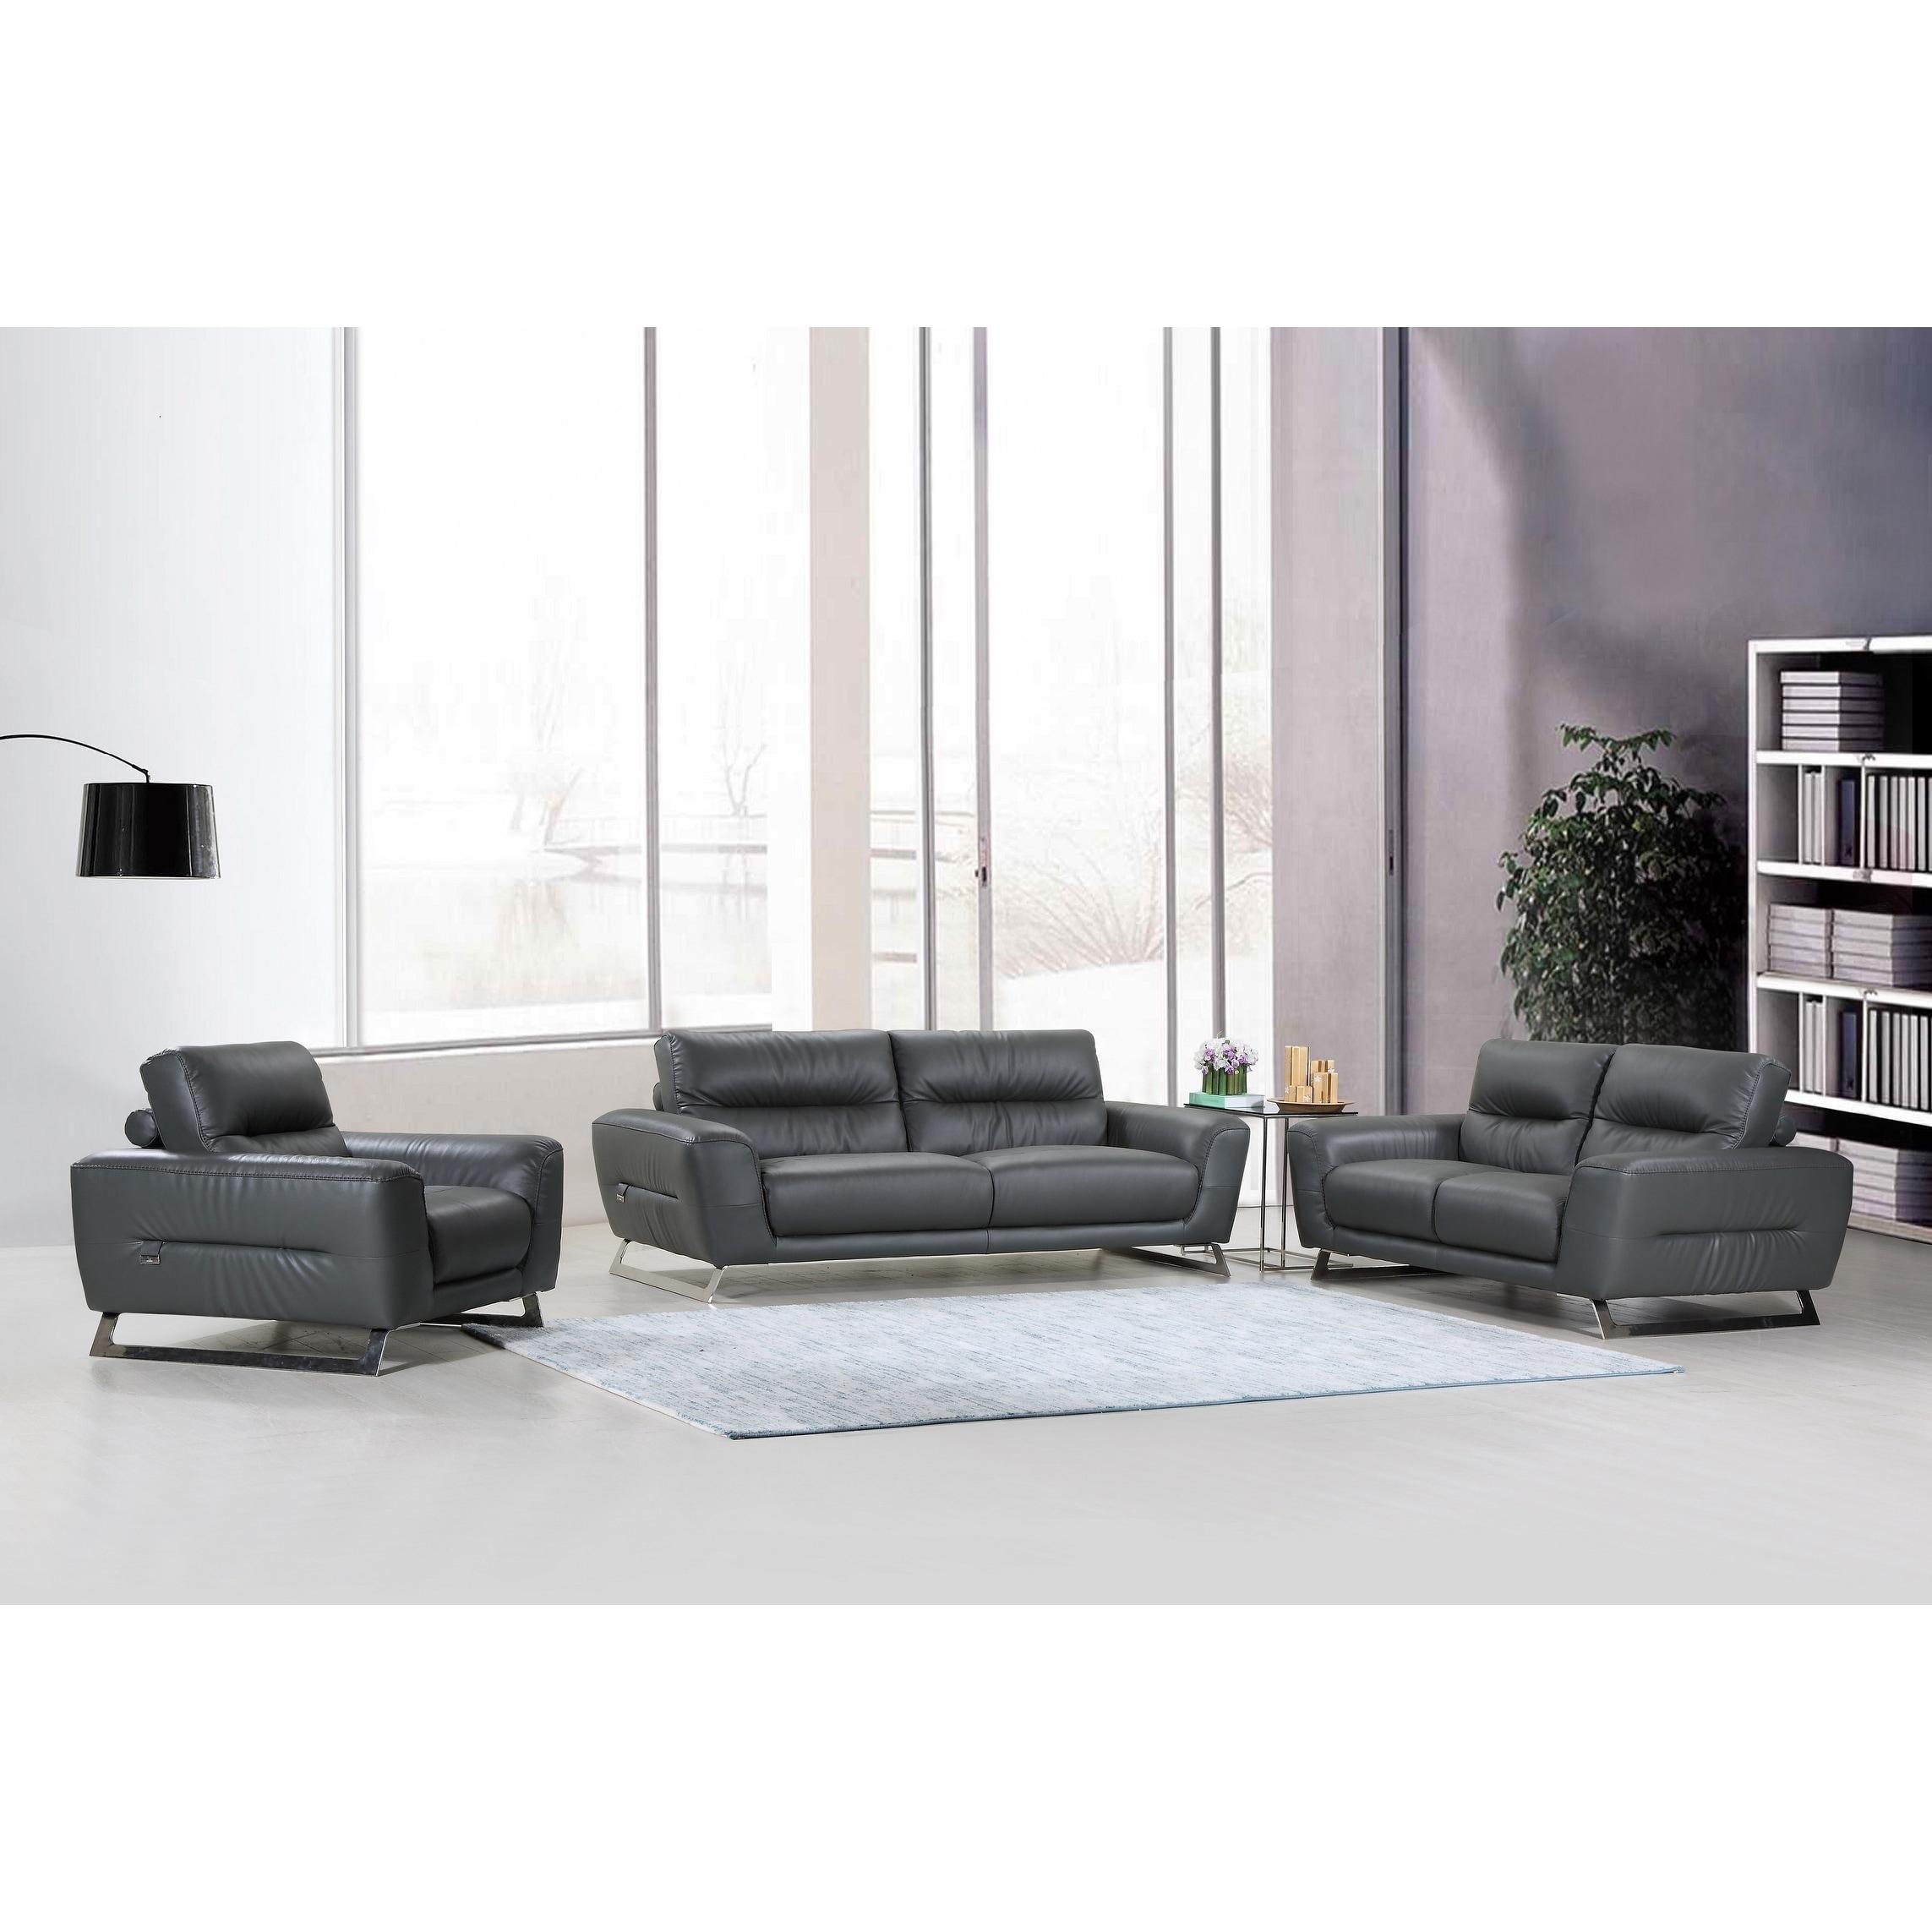 DivanItalia Torino Luxury Italian Leather Upholstered 3-Piece Living ...